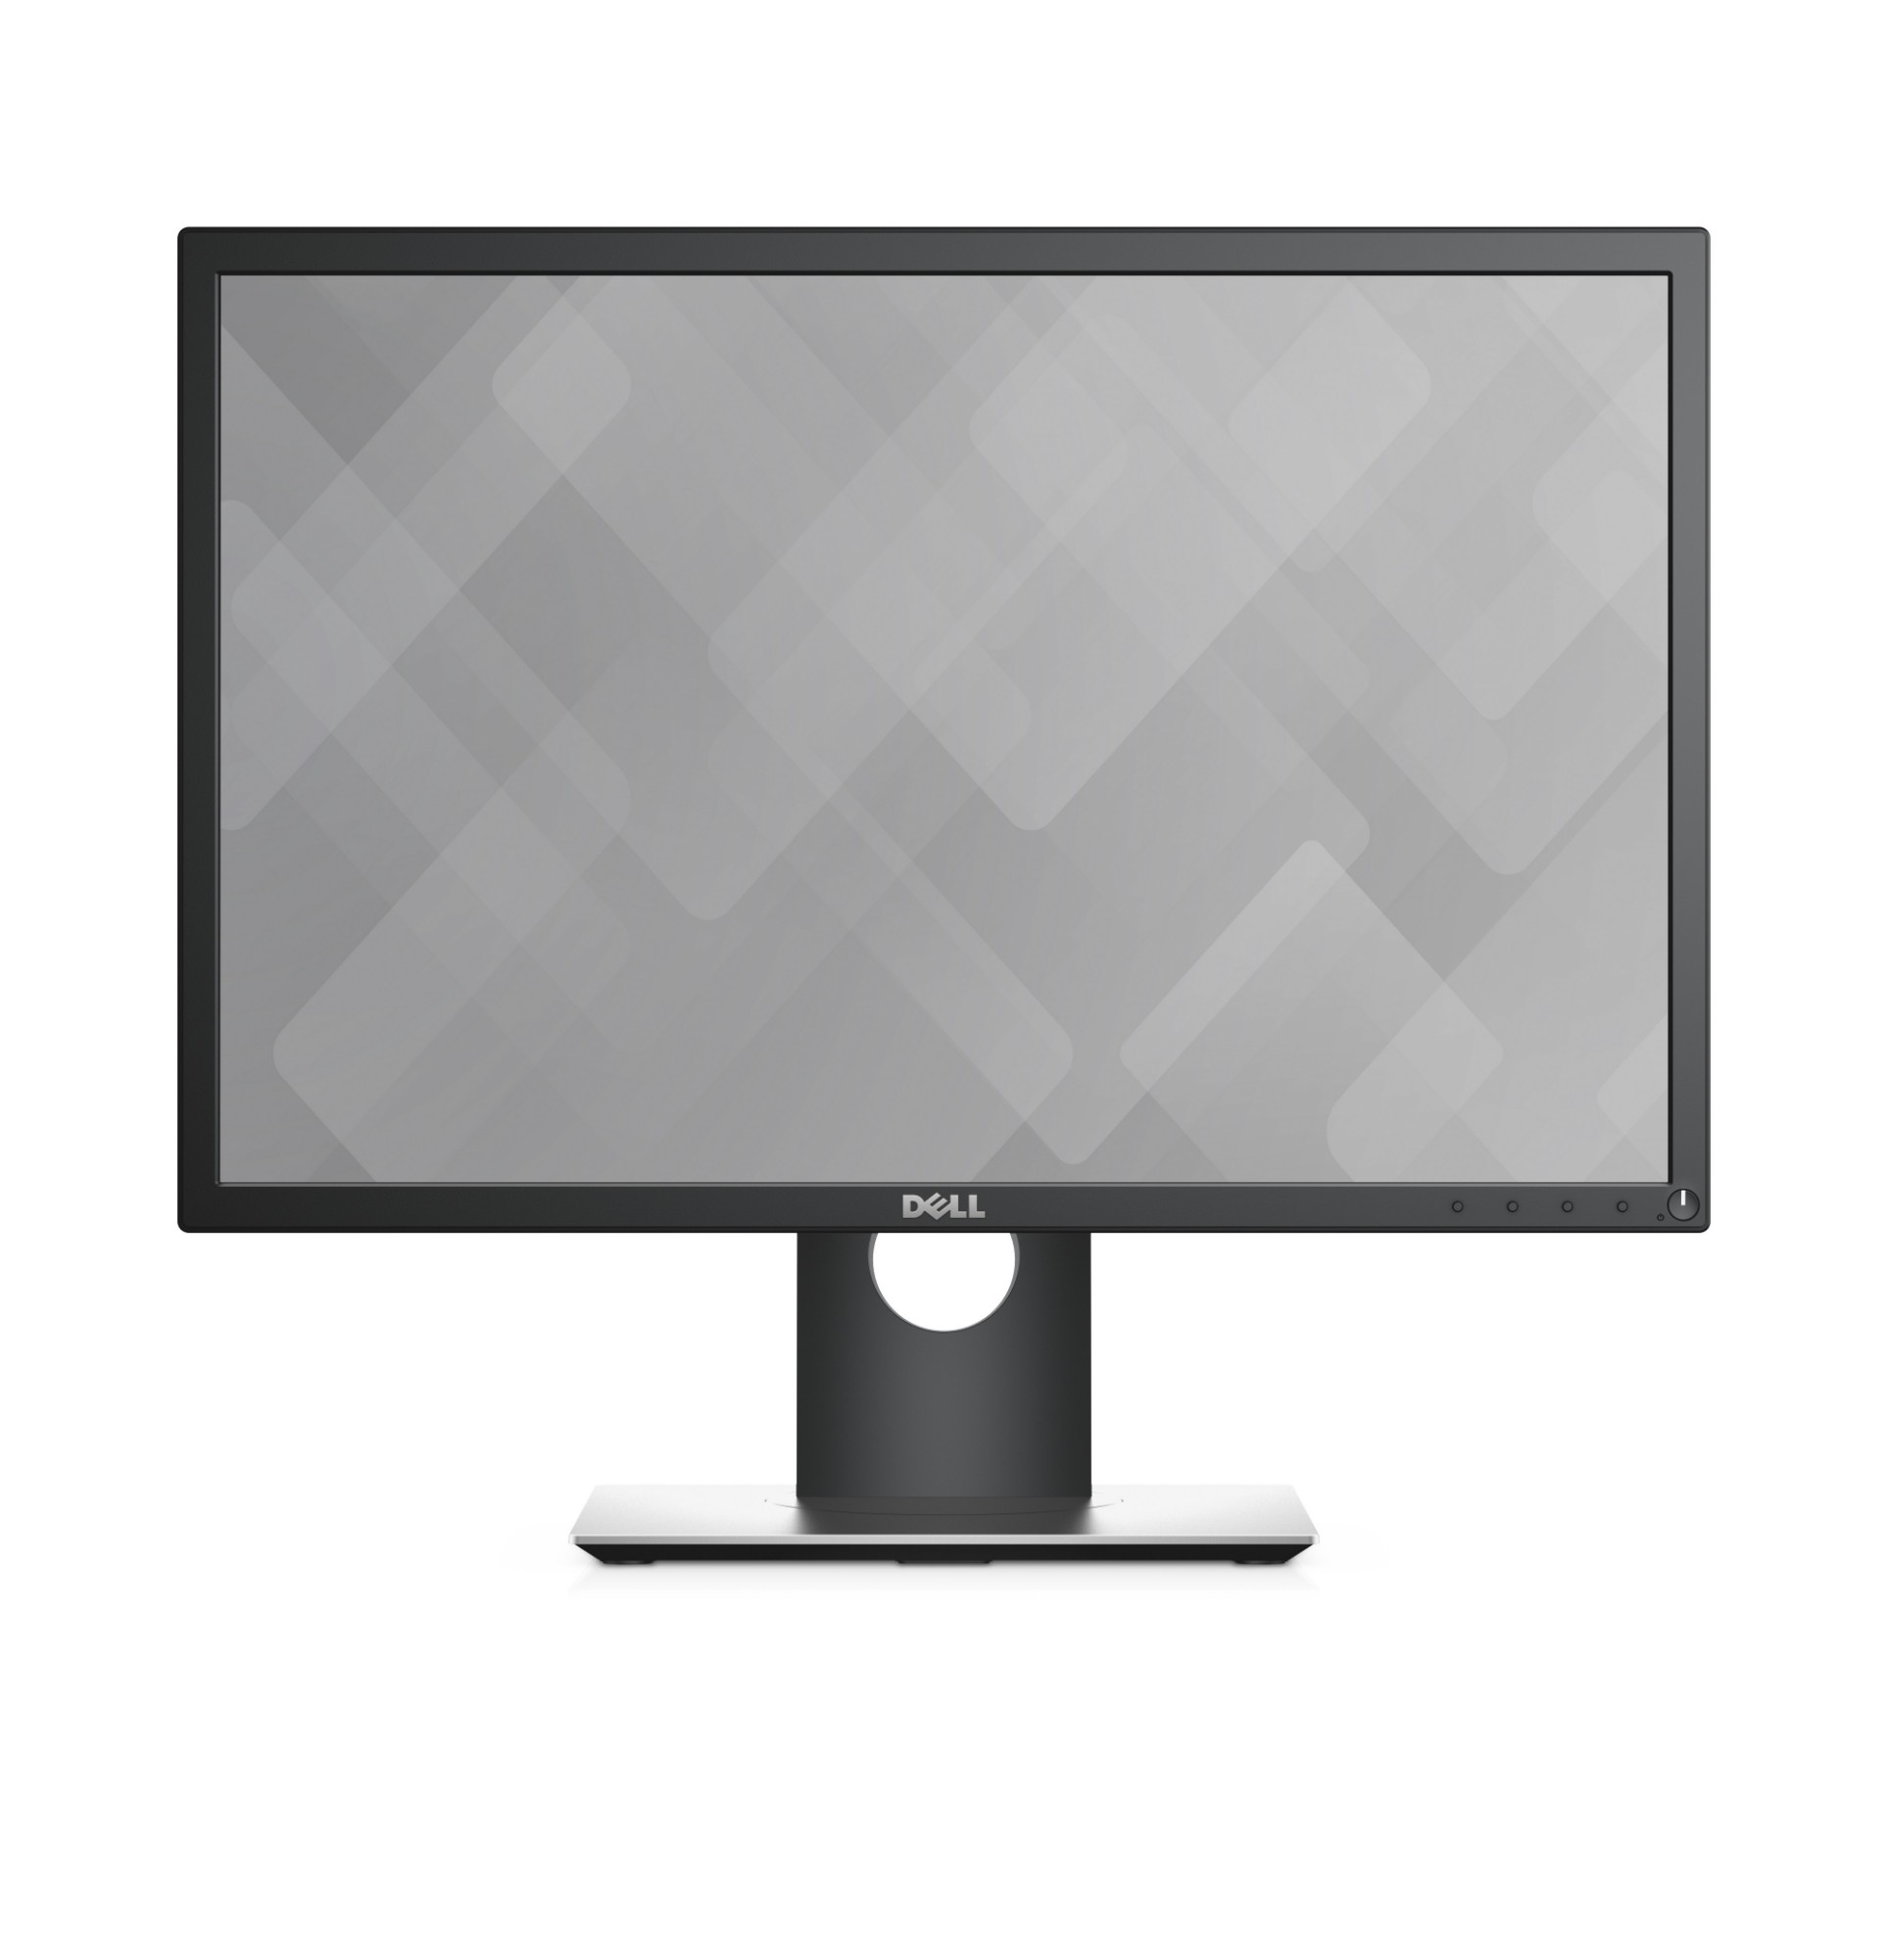 "DELL P2217 LED display 55,9 cm (22"") 1680 x 1050 Pixeles WSXGA+ LCD Negro"